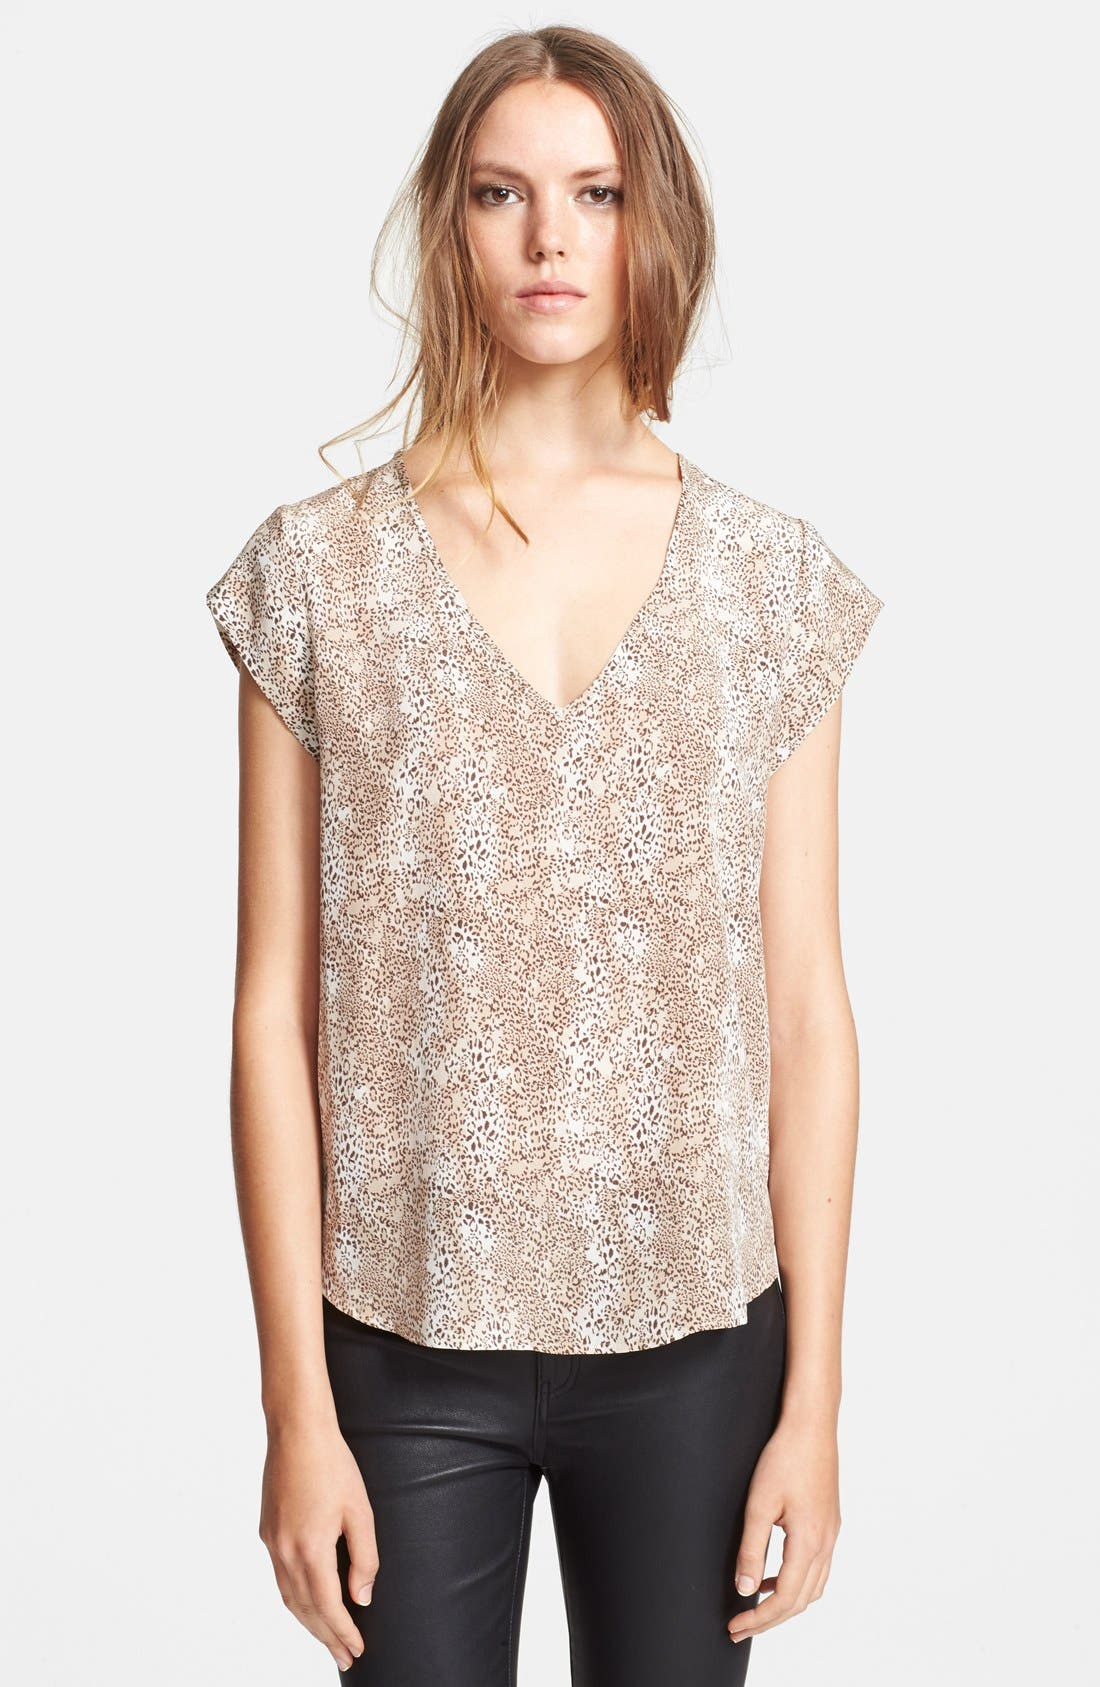 Alternate Image 1 Selected - Joie 'Linny' Print Silk Top